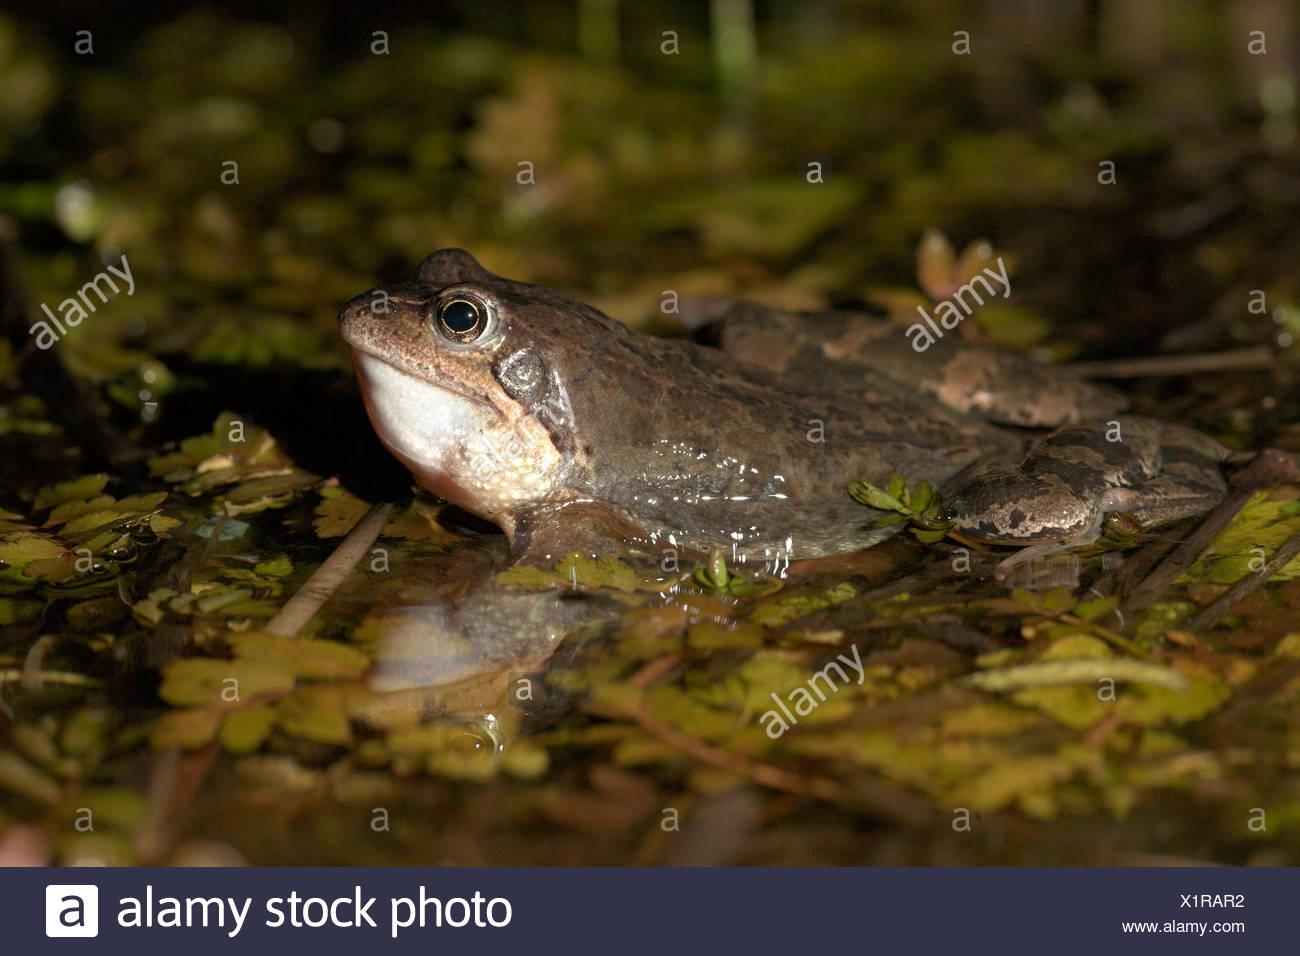 Foto de un macho llamada rana común (véase su garganta inflamada) Foto de stock